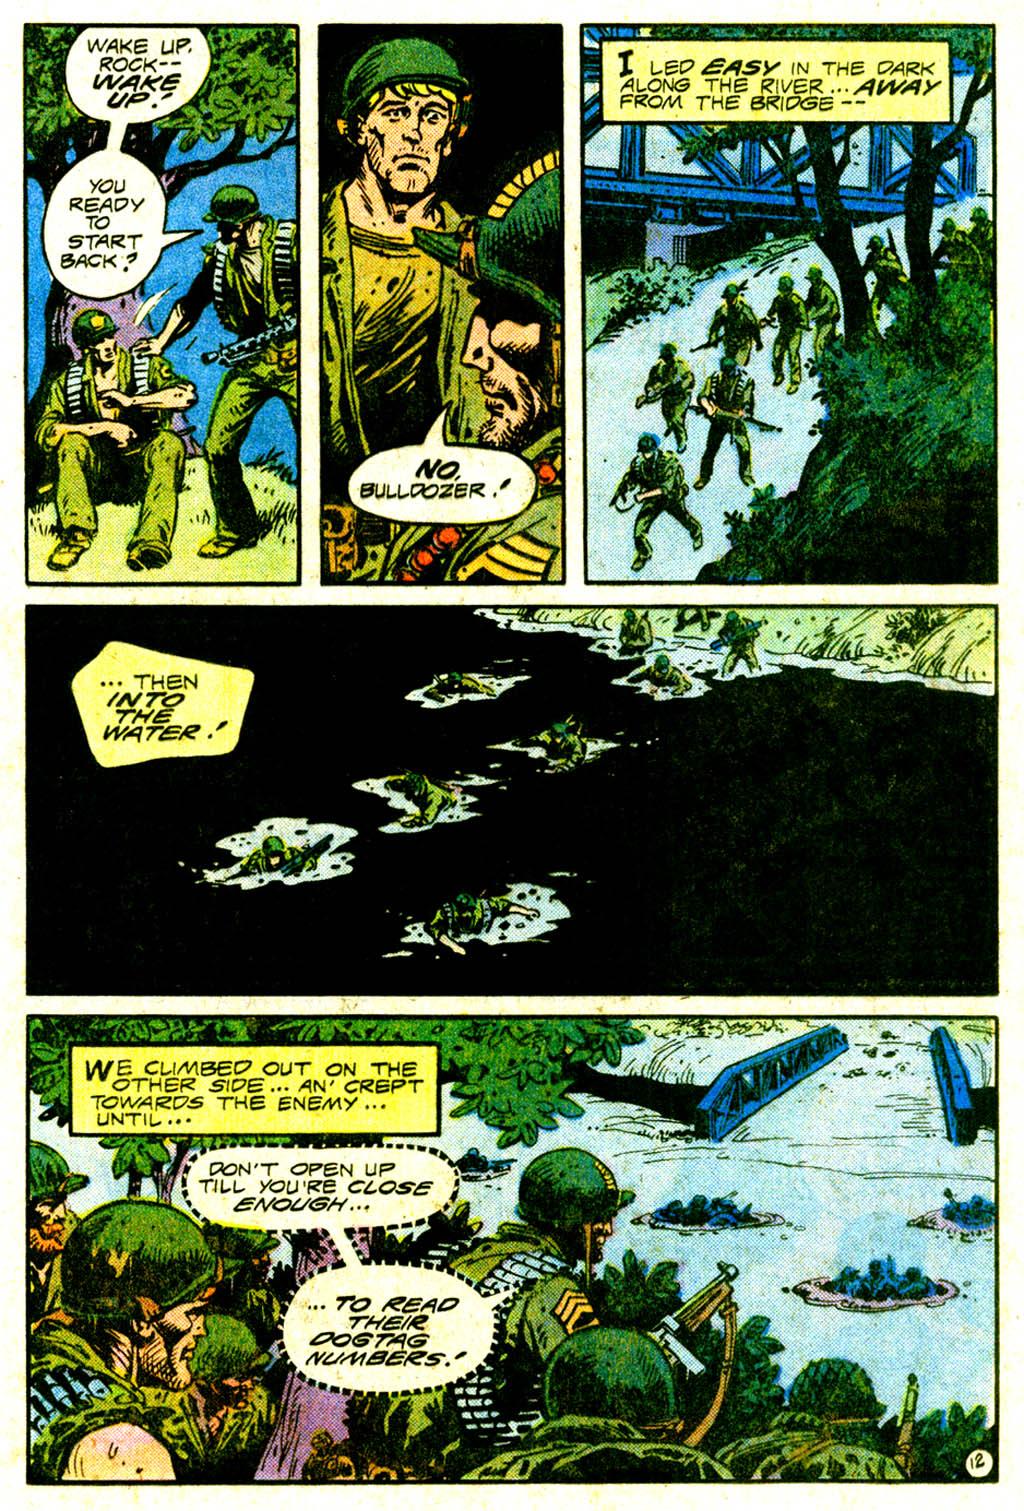 Read online Sgt. Rock comic -  Issue #375 - 16